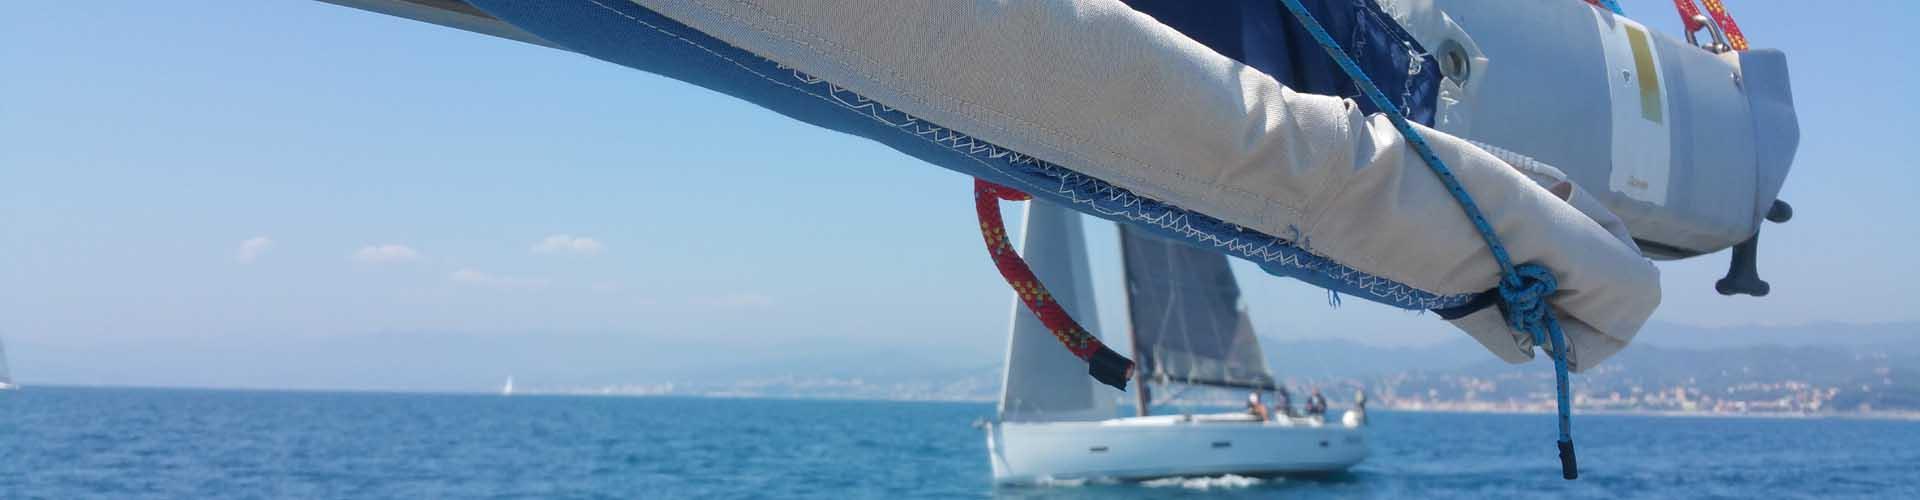 Categoria: <span>Marina di Varazze</span>